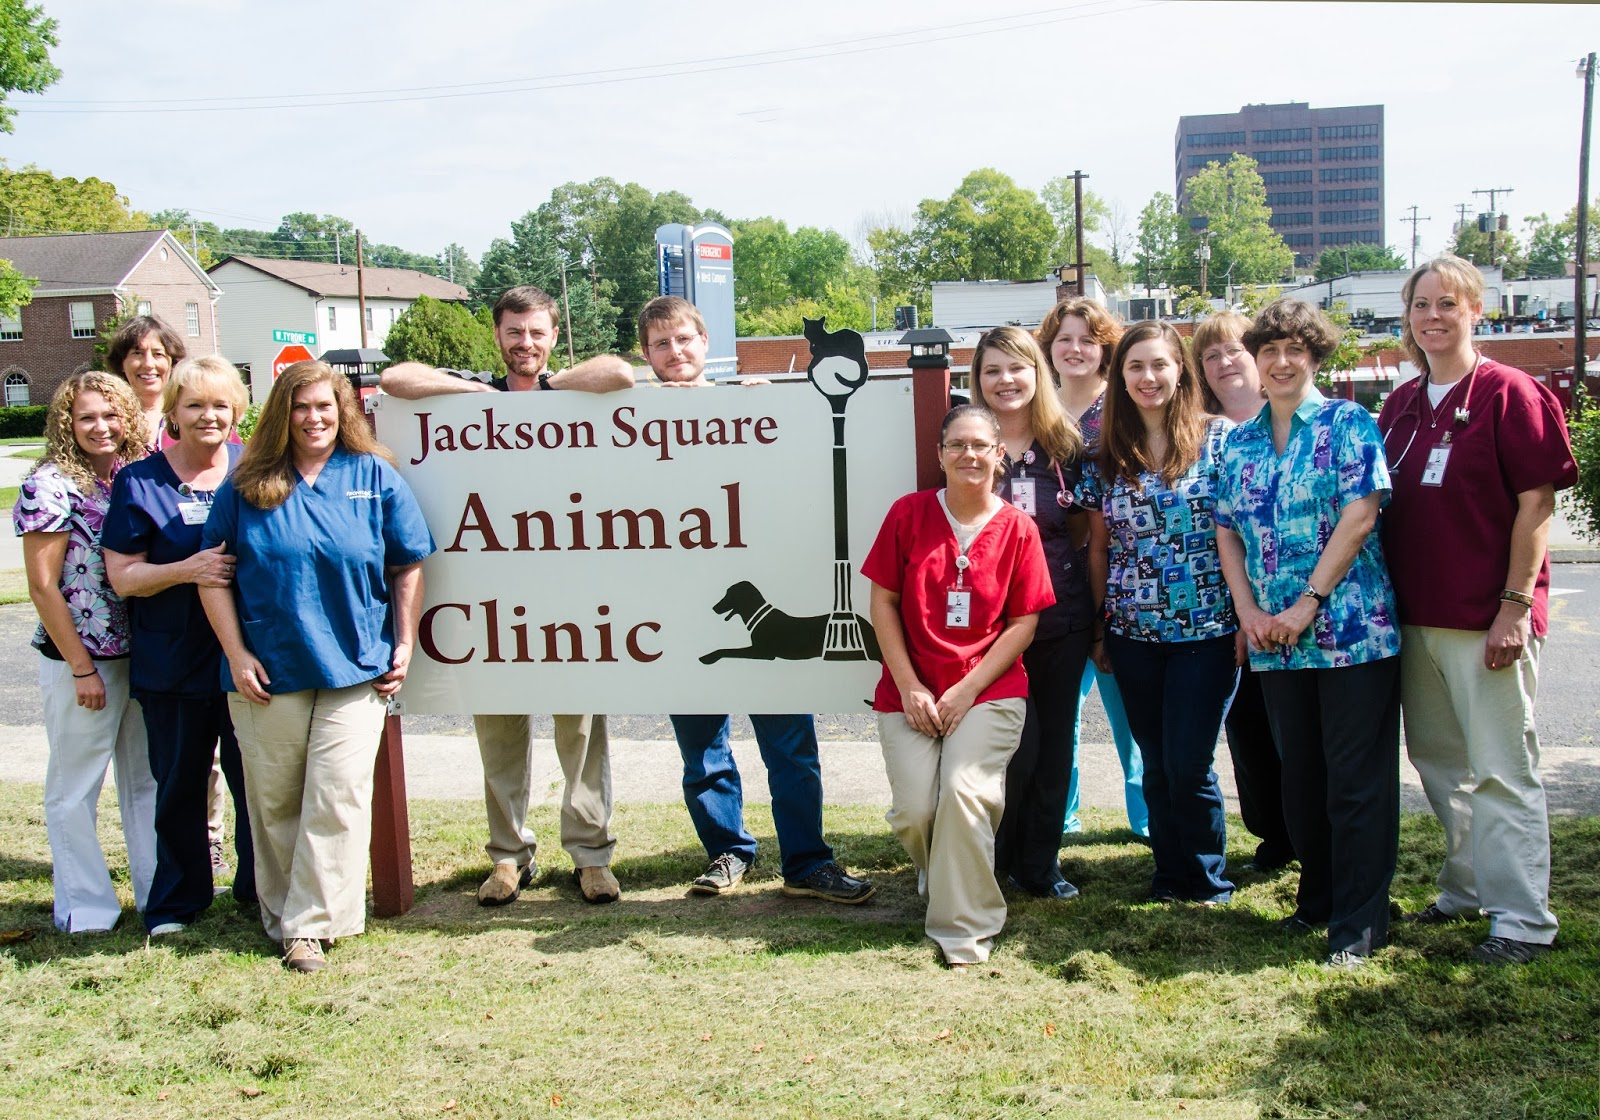 Jackson Sq. Animal Clinic staff photo